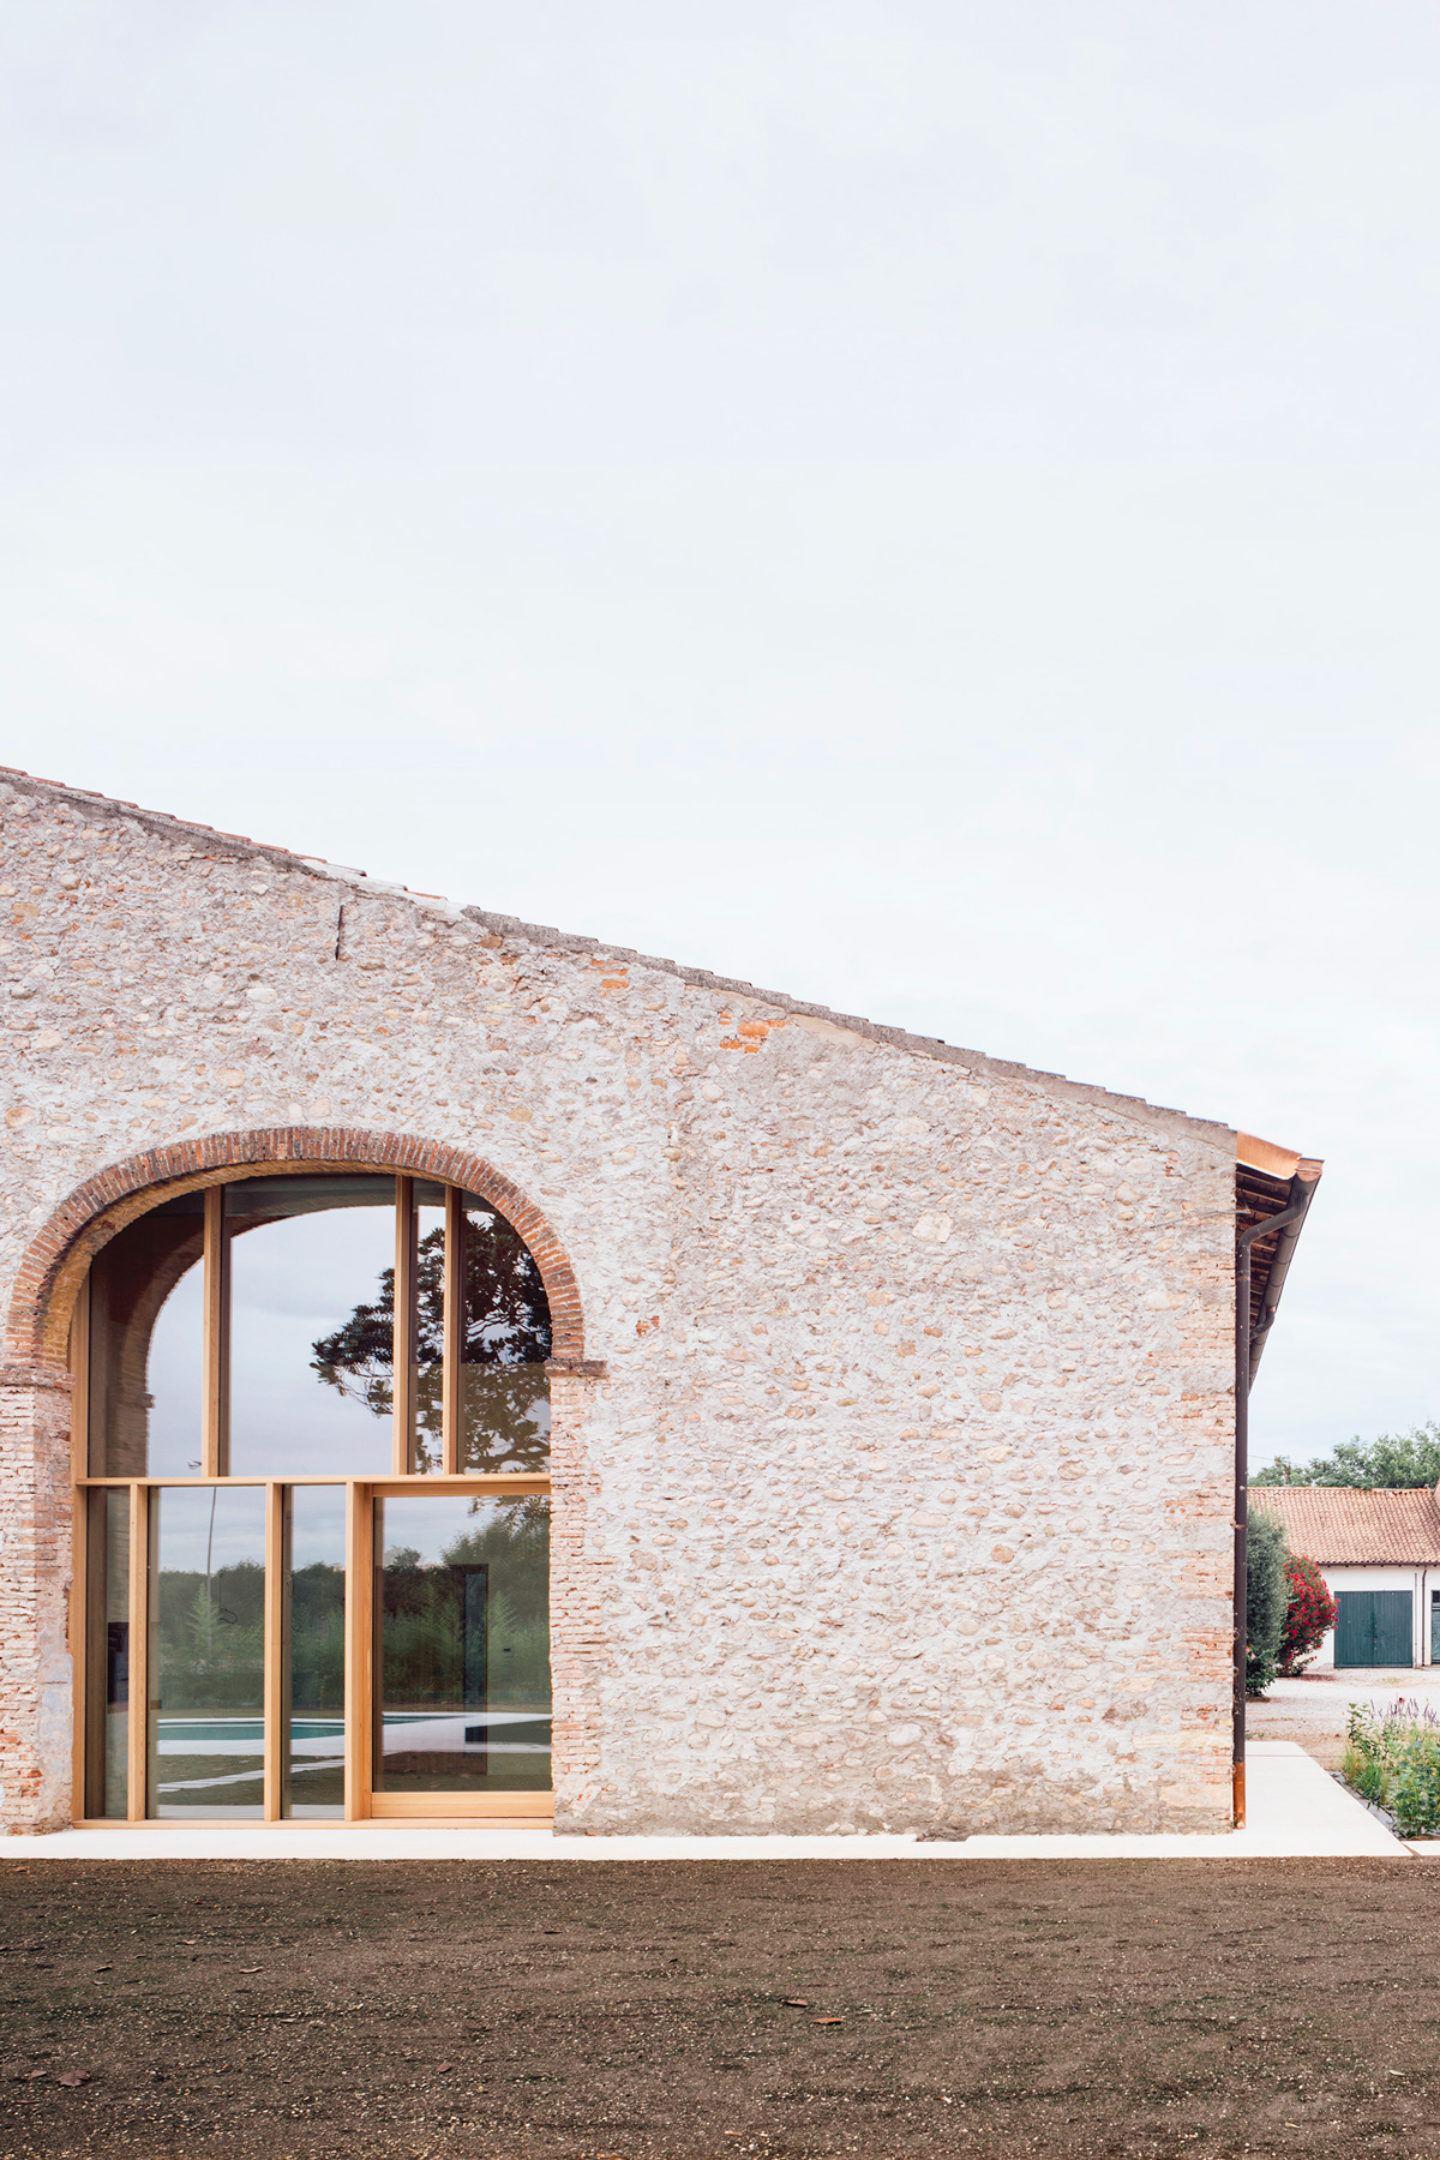 IGNANT-Architecture-Studio-Wok-Country-Home-In-Chievo-5